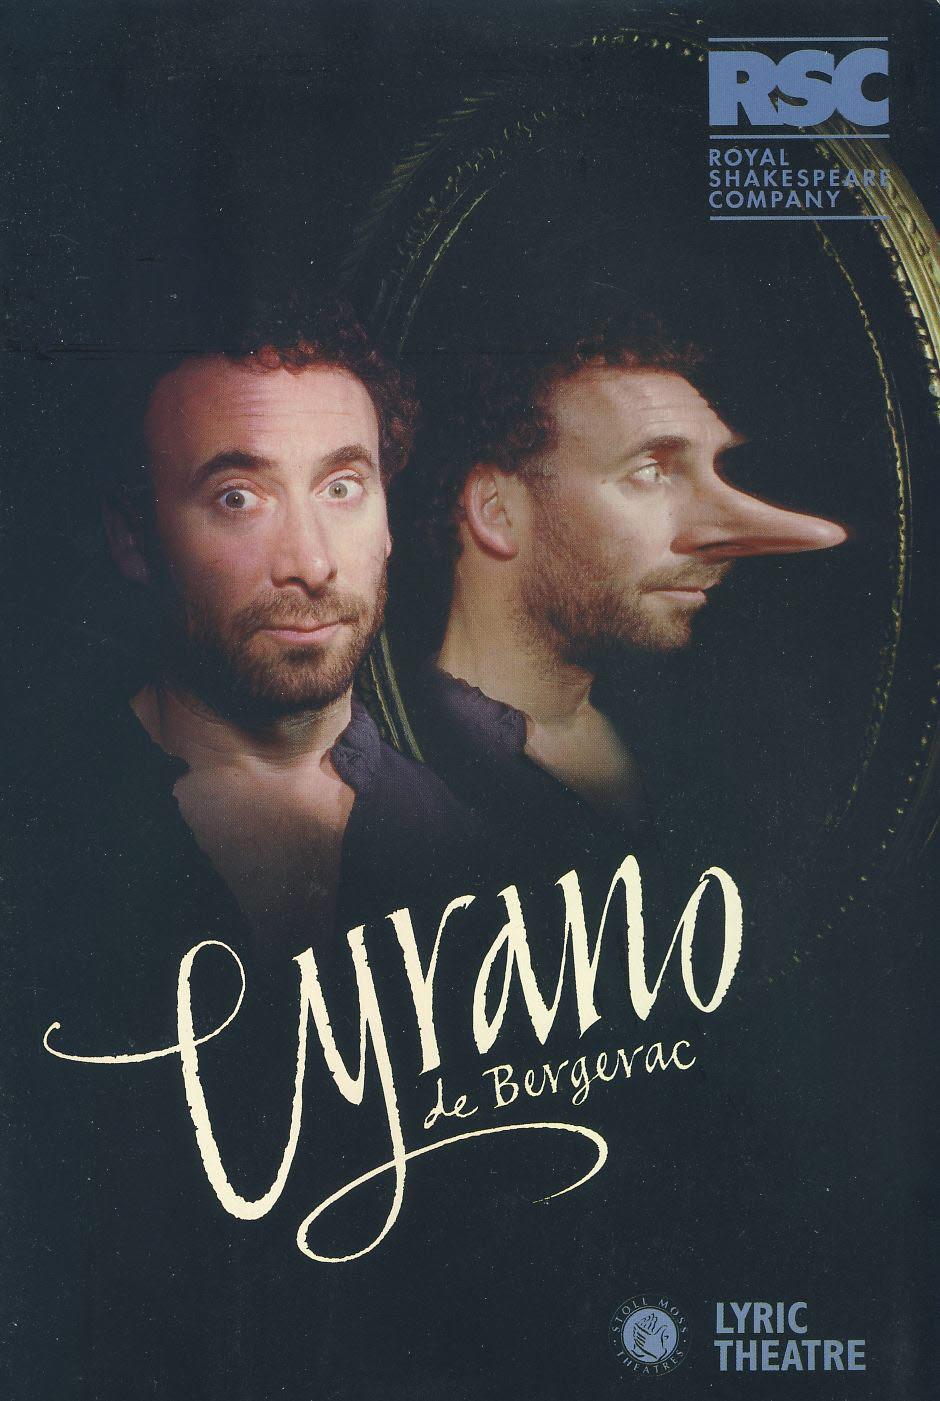 Cyrano de Bergerac 1997 Lyric Theatre Programme refb100880 Good Condition. Measure approx 17.5cm x 25cm